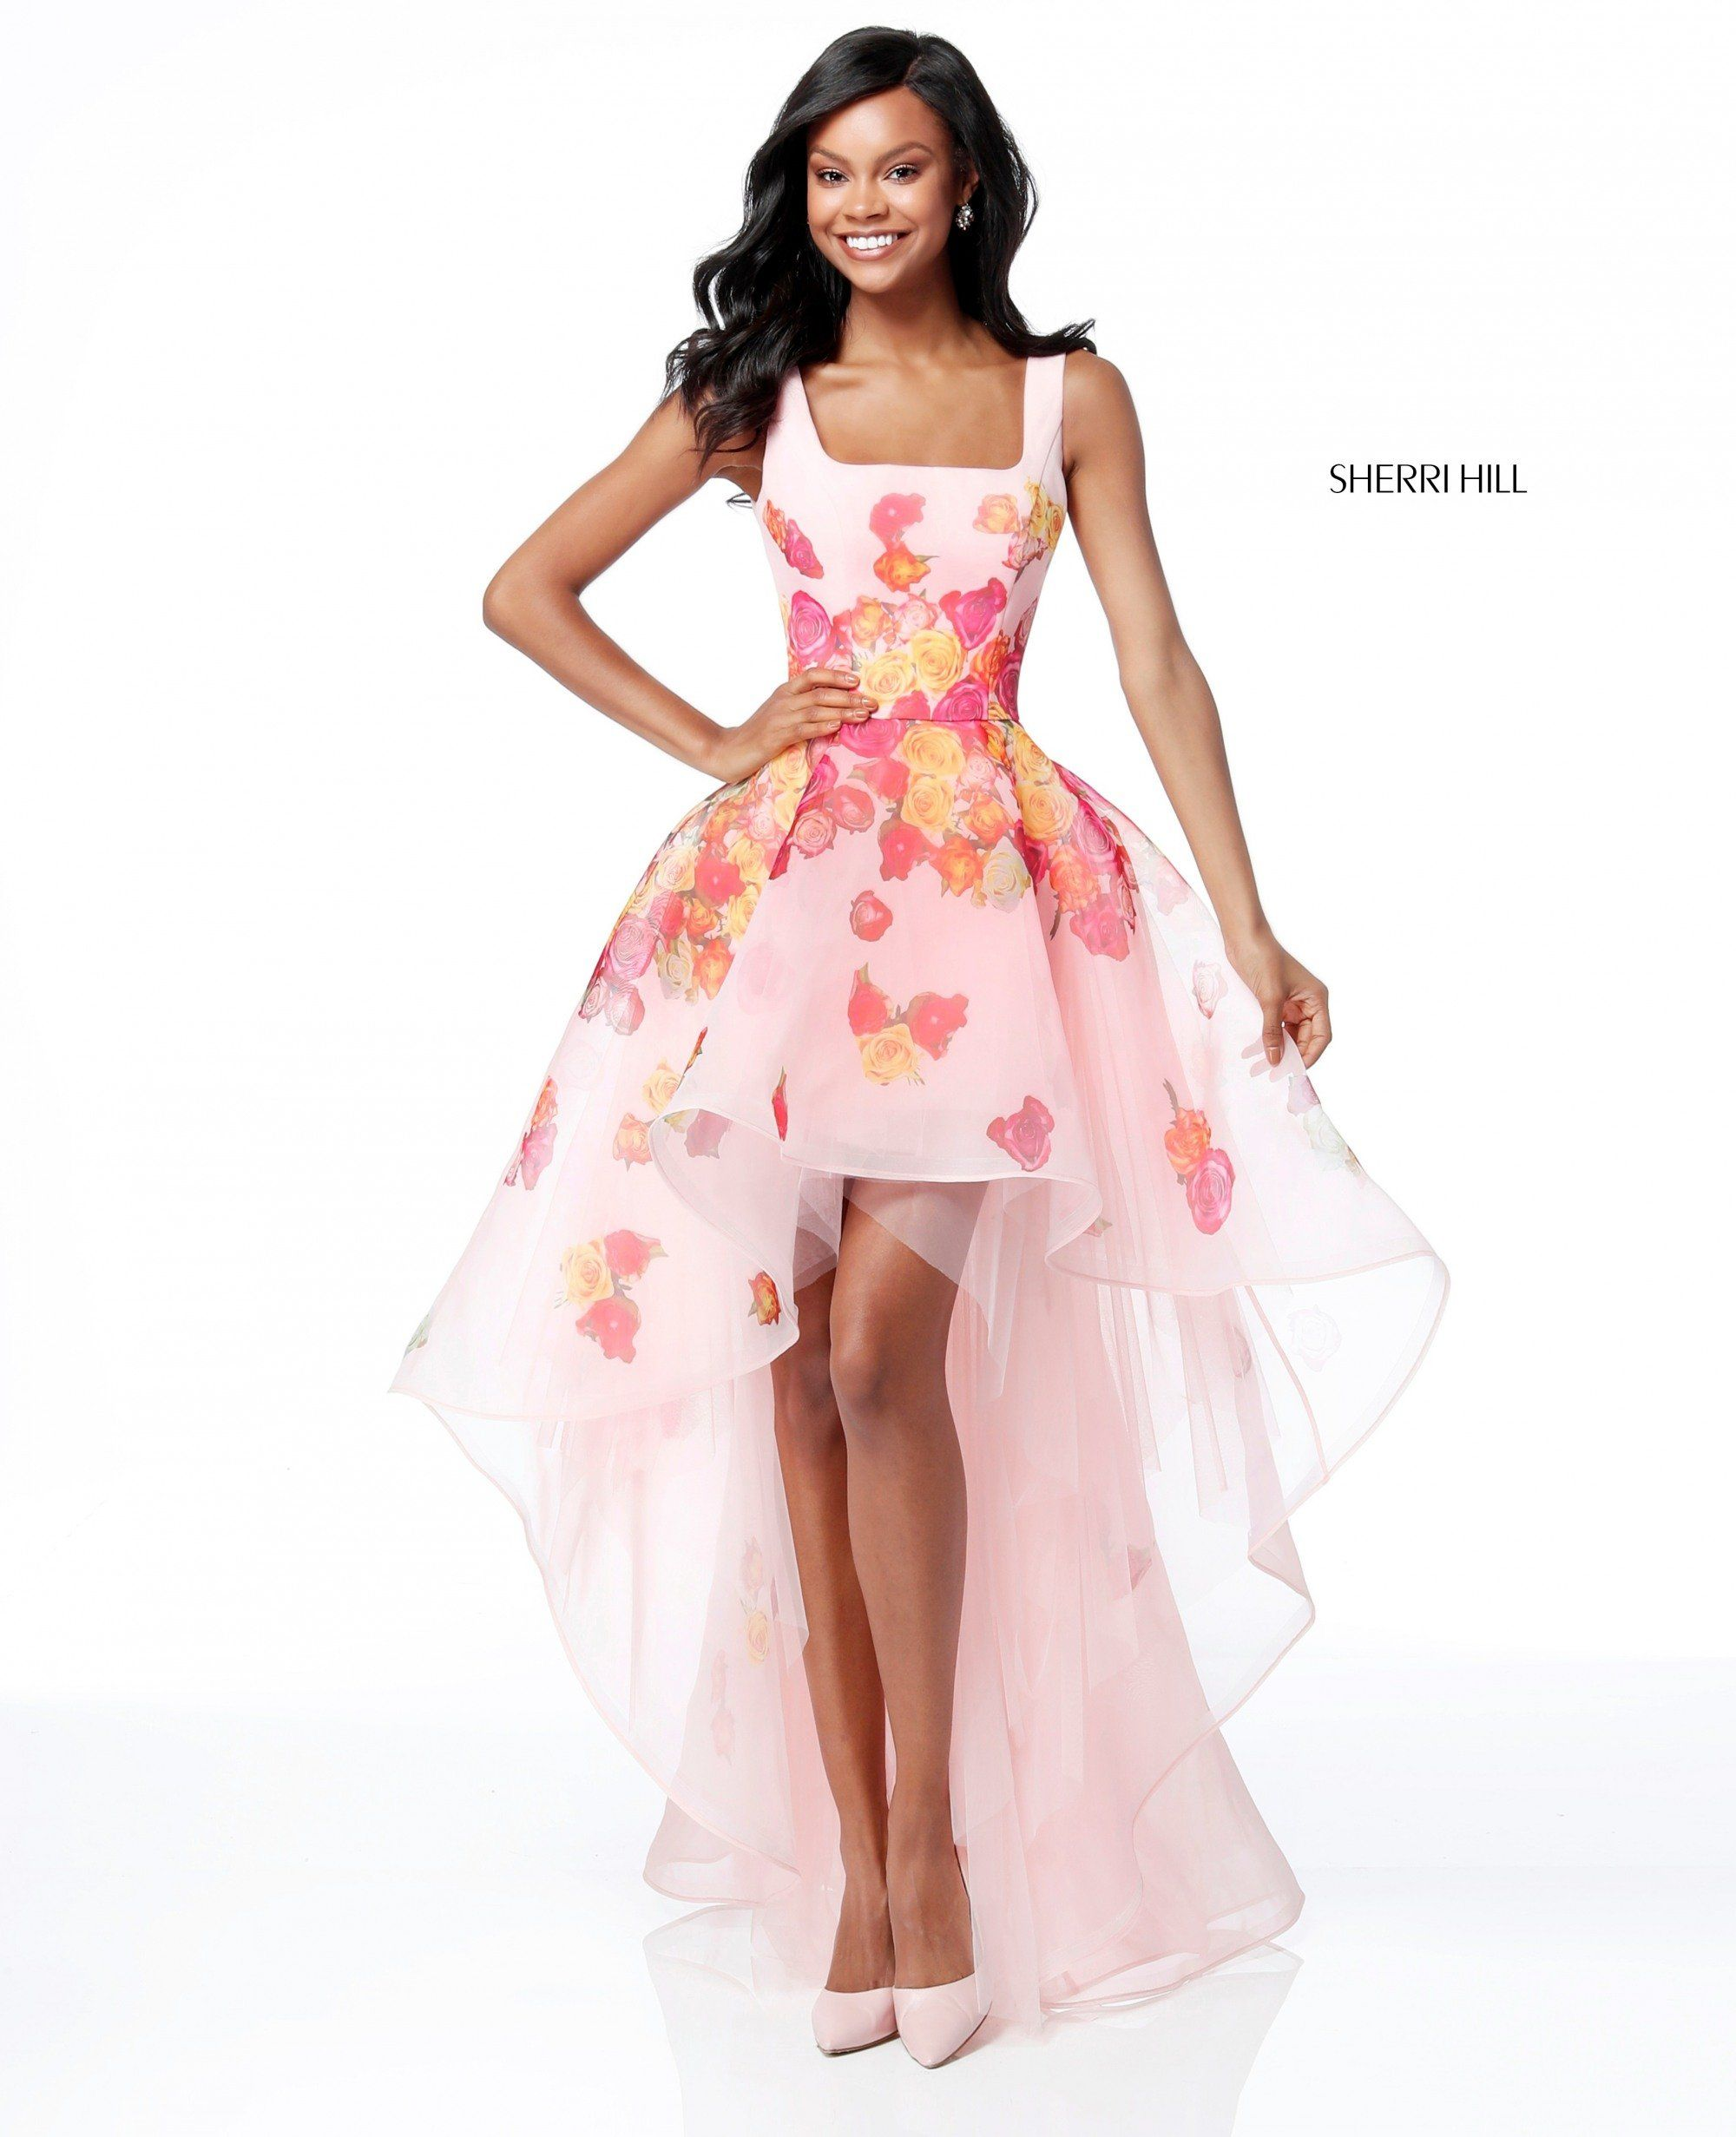 Sherri Hill 51684 | Pinterest | Prom, Formal wear and Homecoming dresses